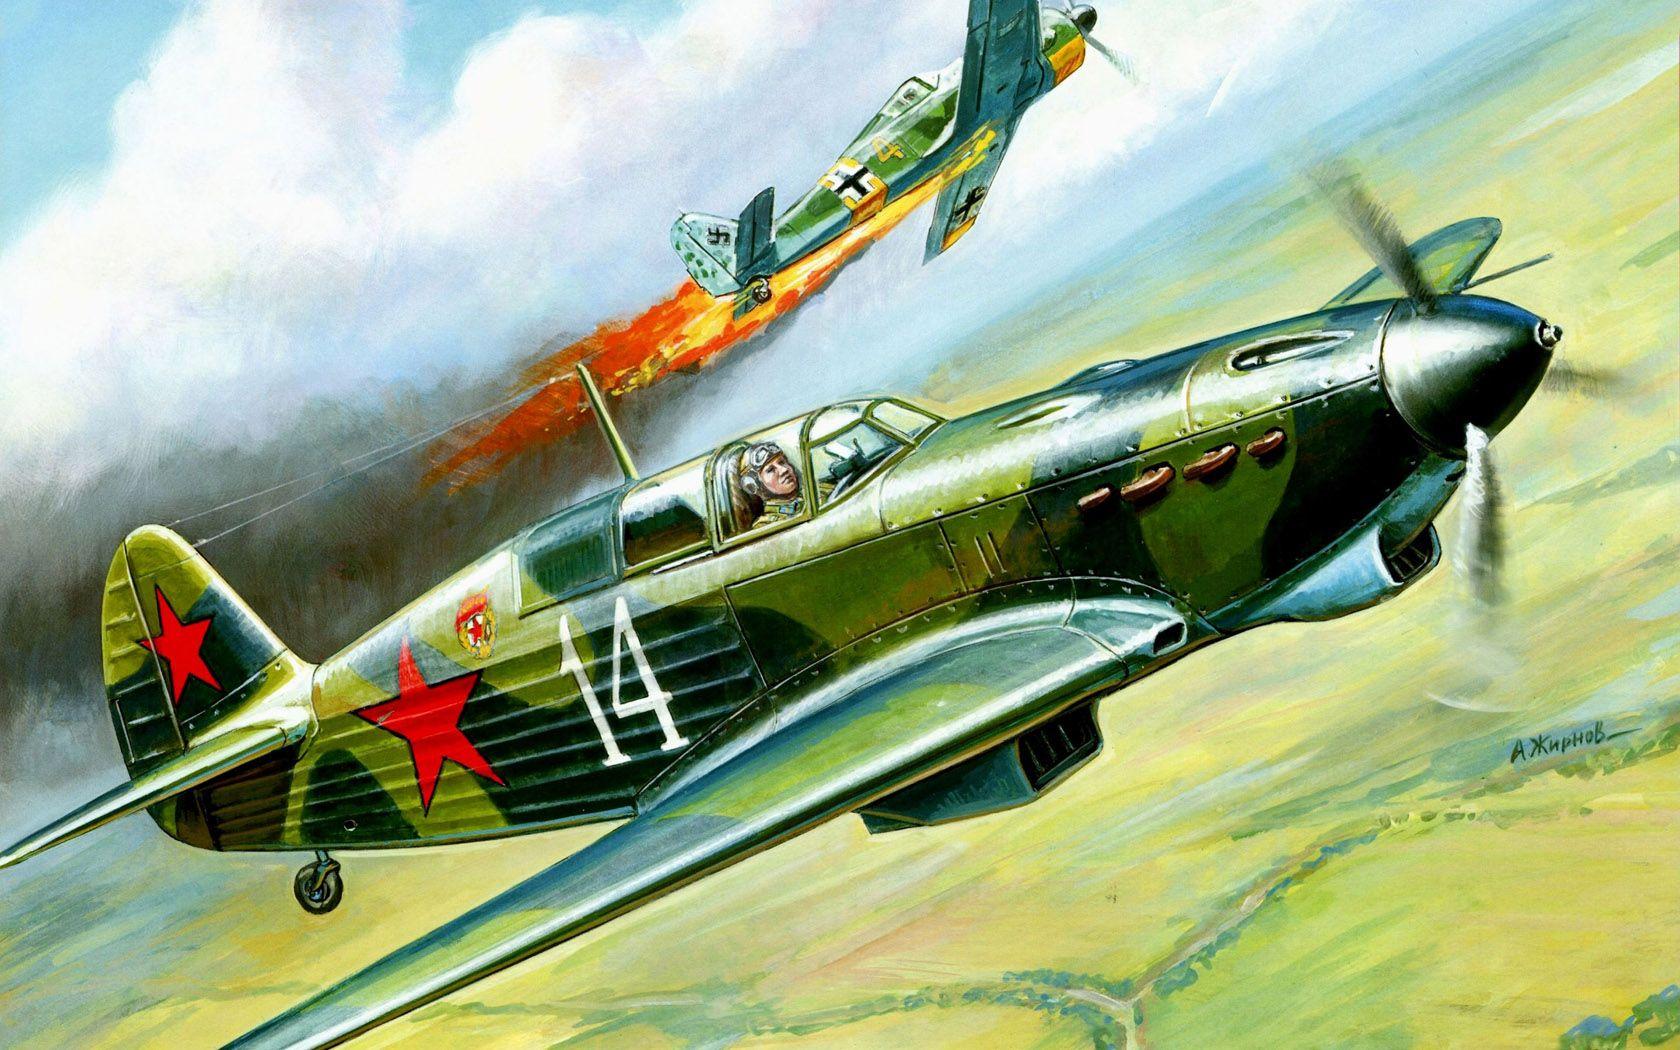 Wallpaper_3664_Aviation_Fighter_Yak-7.jpg (1680×1050)